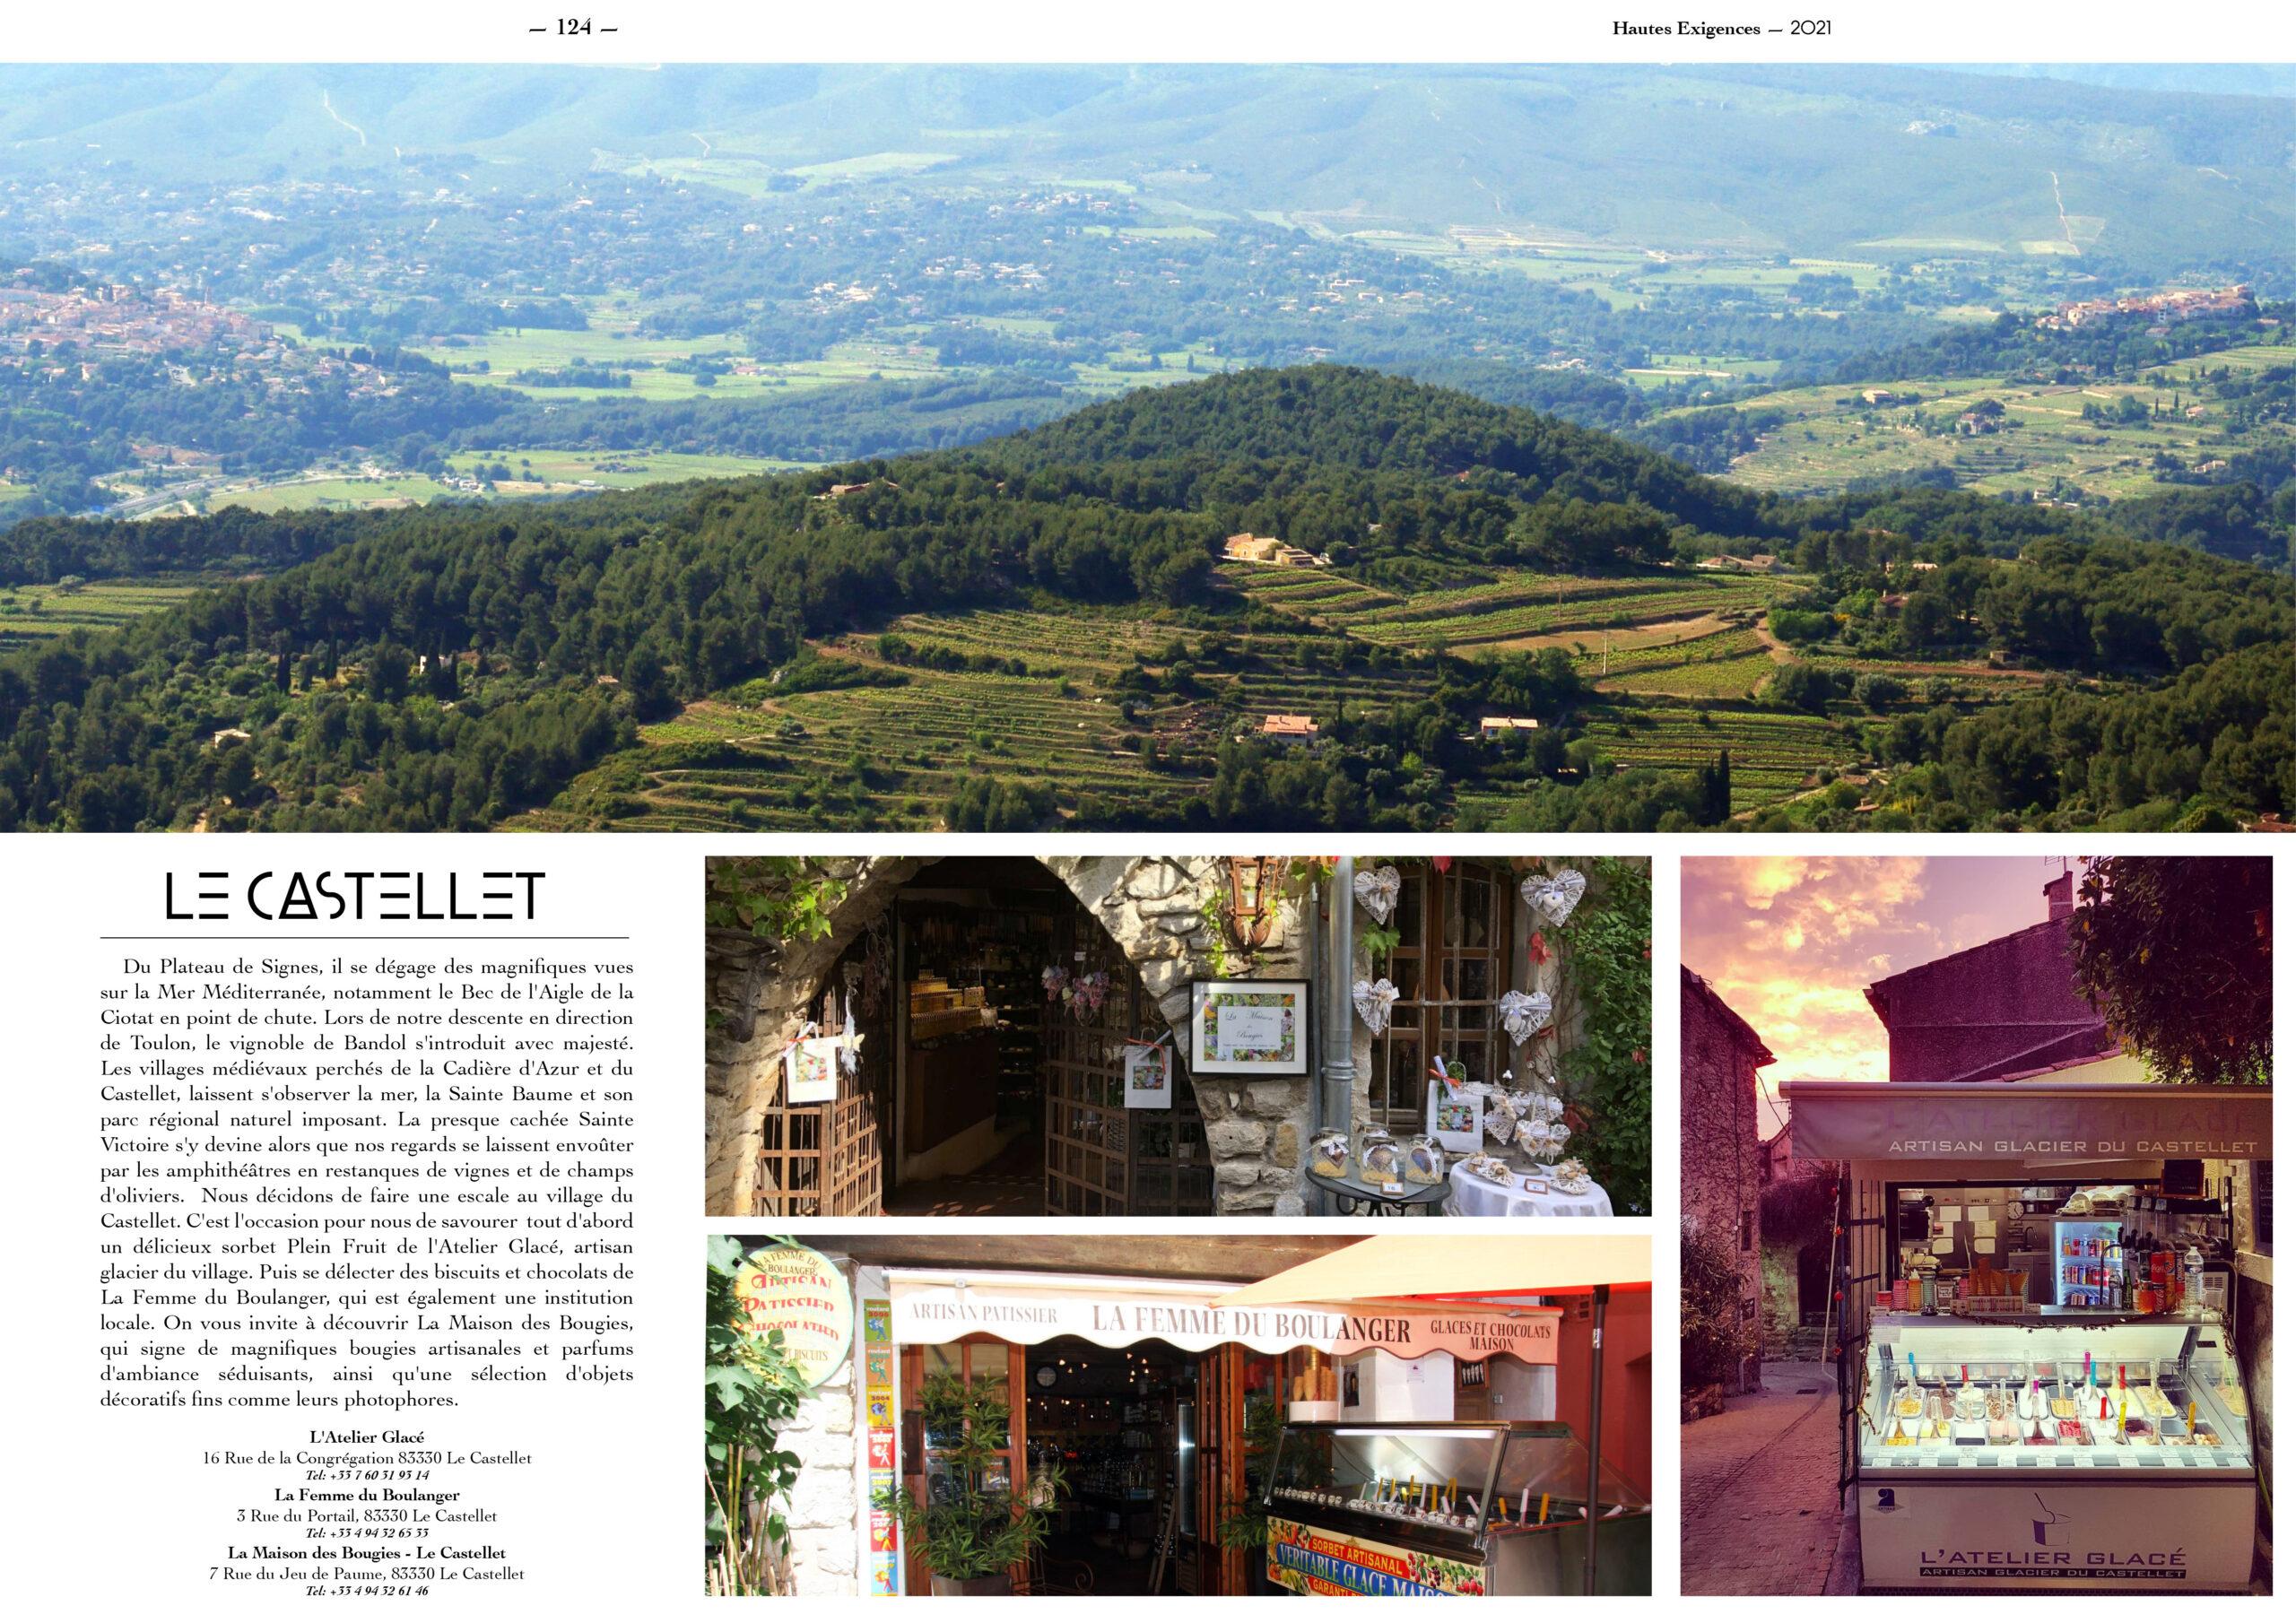 Hautes Exigences Magazine Hors Serie 2021 page 122-123